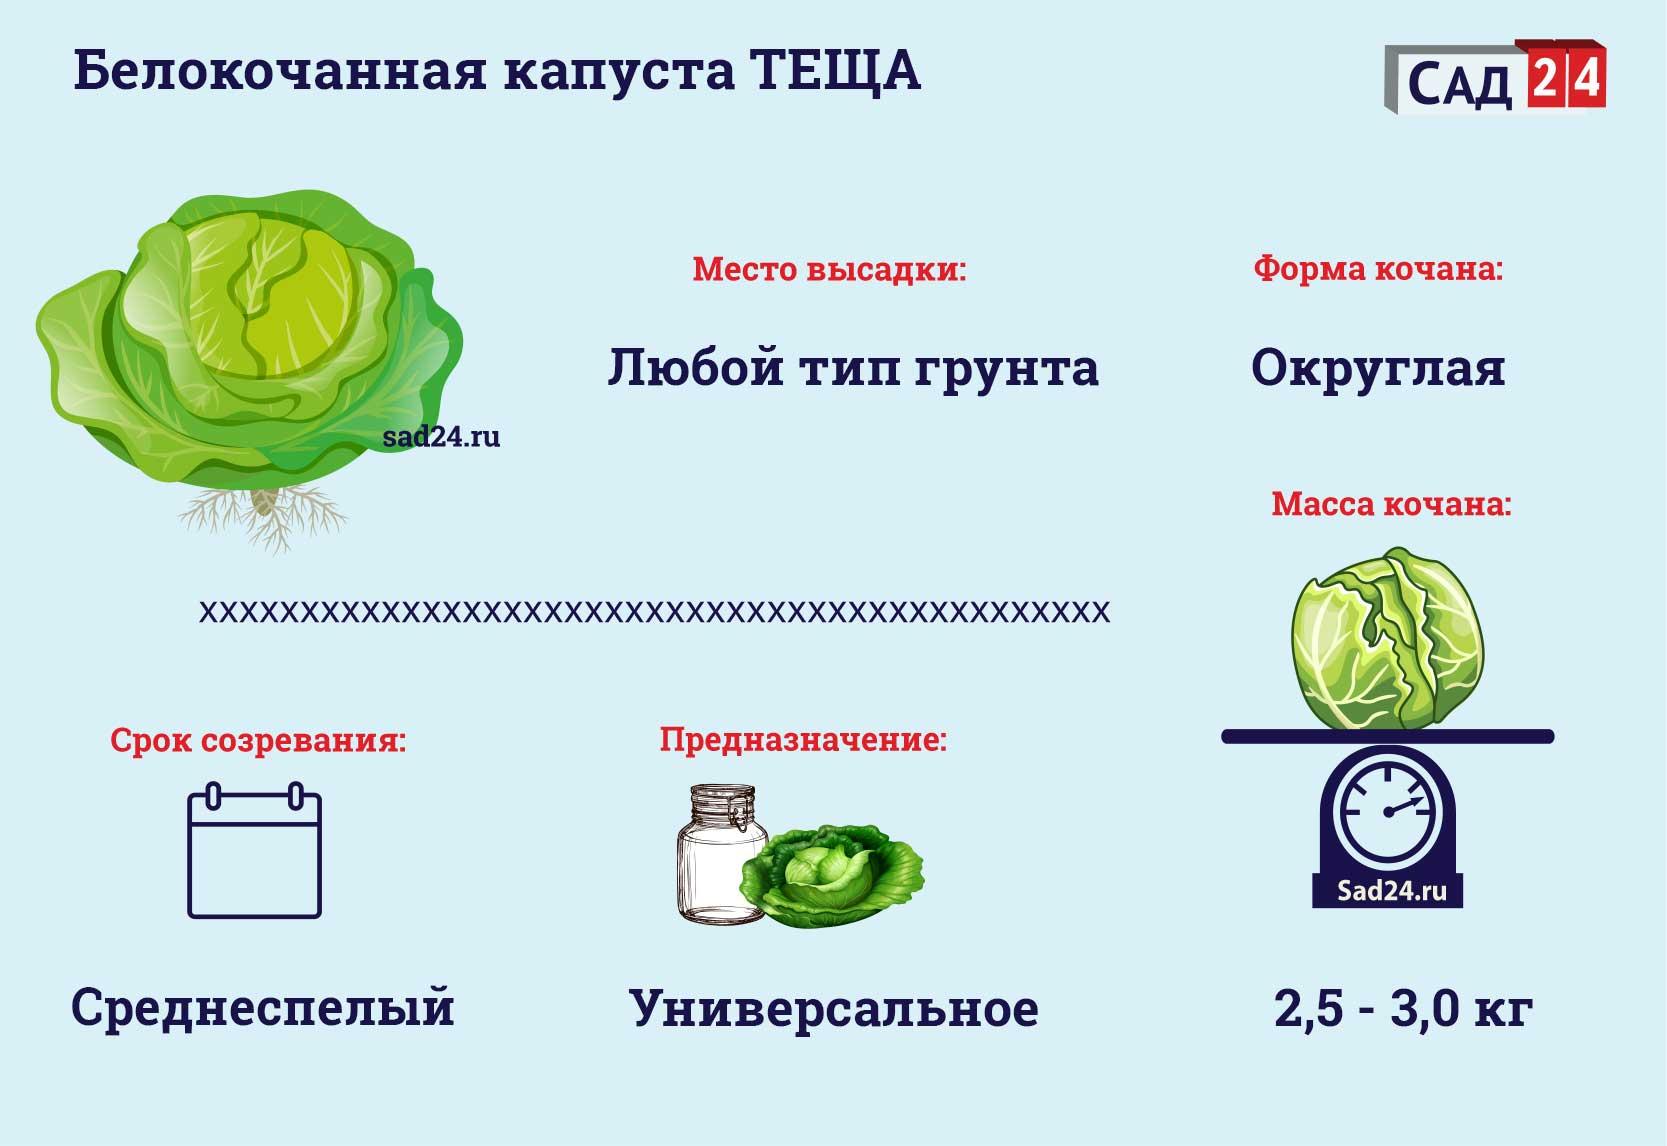 Теща - https://sad24.ru